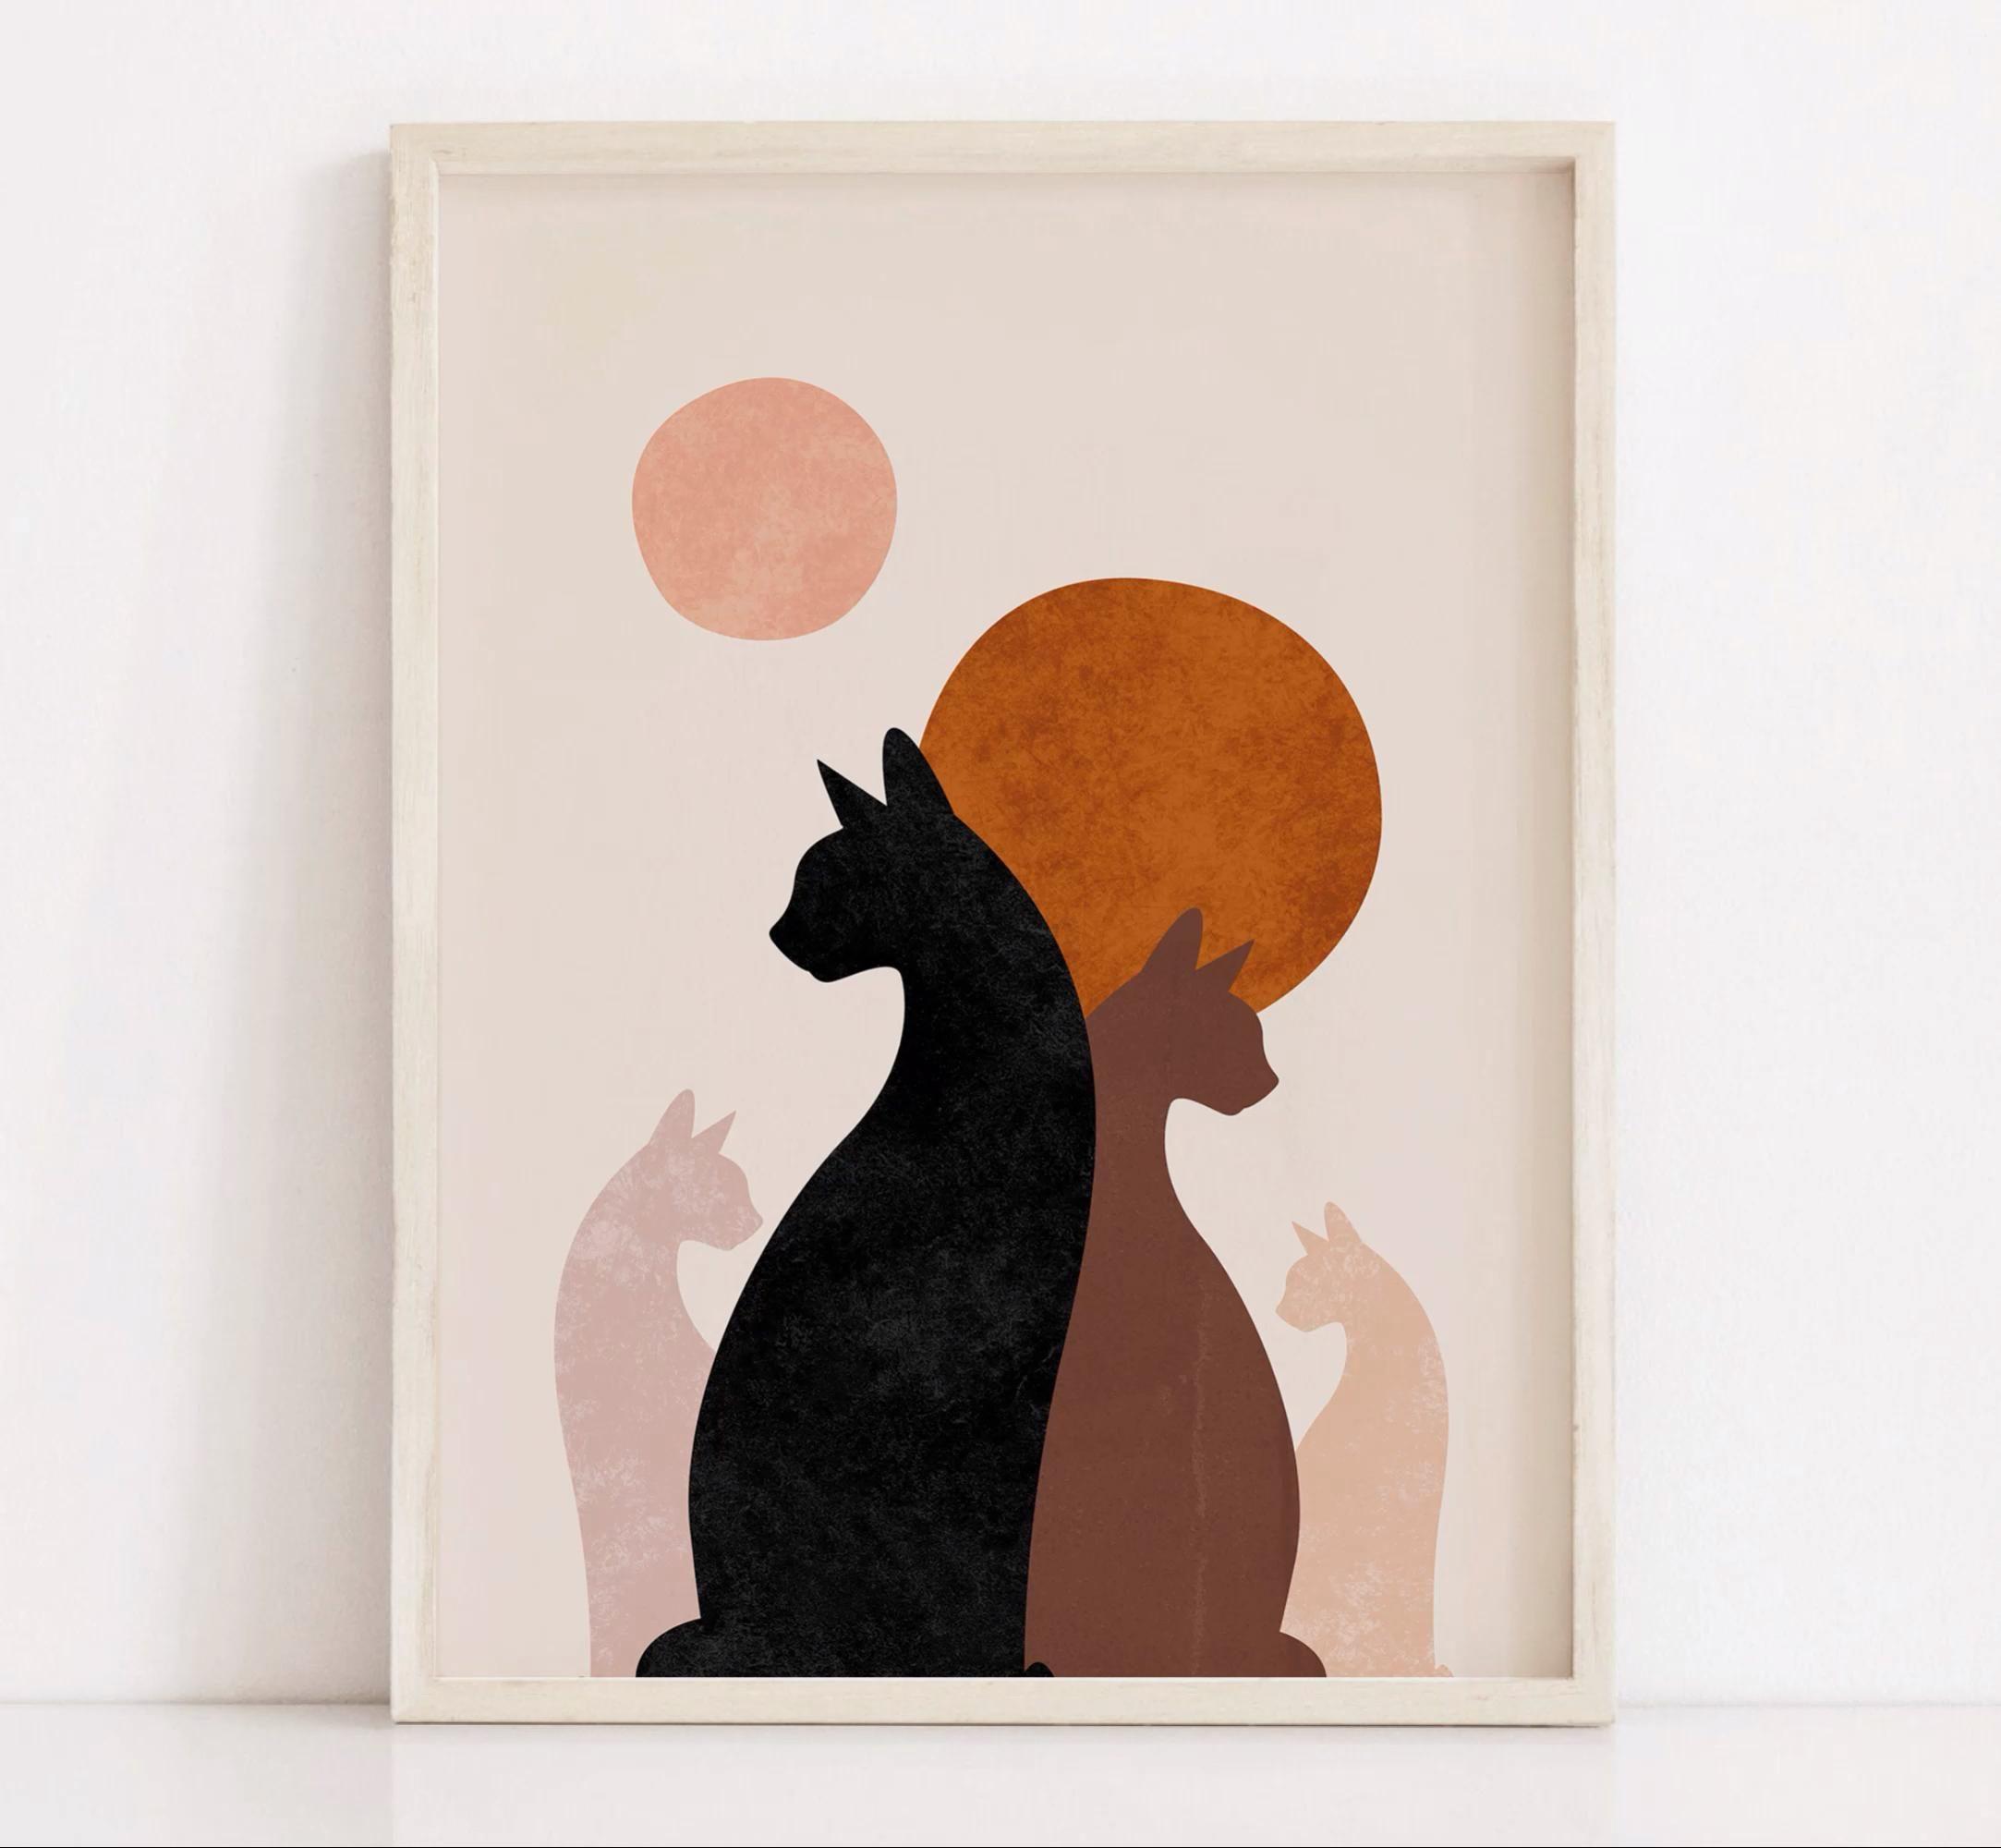 Wall Art Print Digital Artwork Downloadable Prints Digital Home Deco Printable Abstract Modern Art Modern Cat Abstract Cat Painting